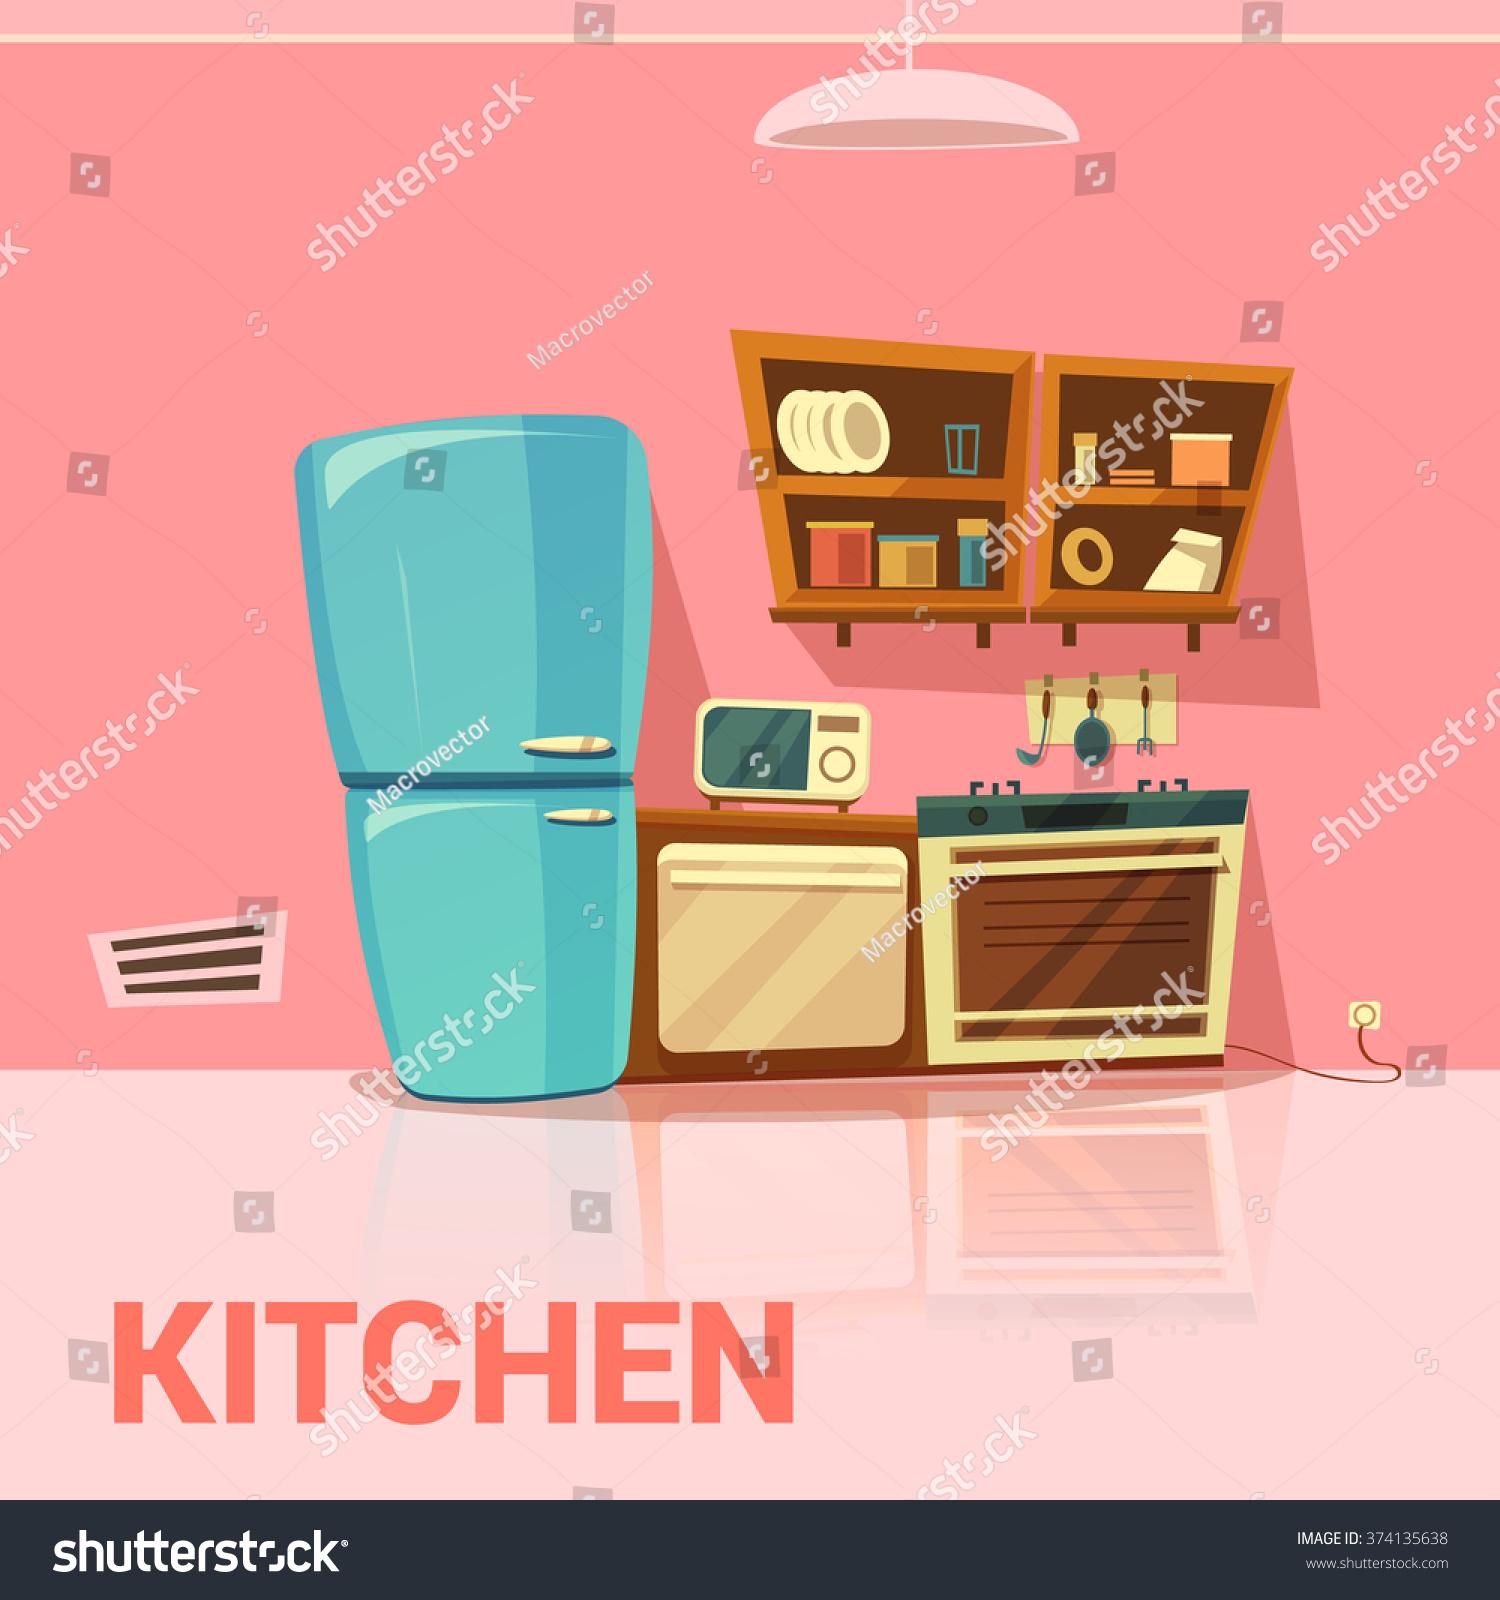 Retro Kitchen Illustration: Kitchen Retro Design Fridge Microwave Oven Stock Vector